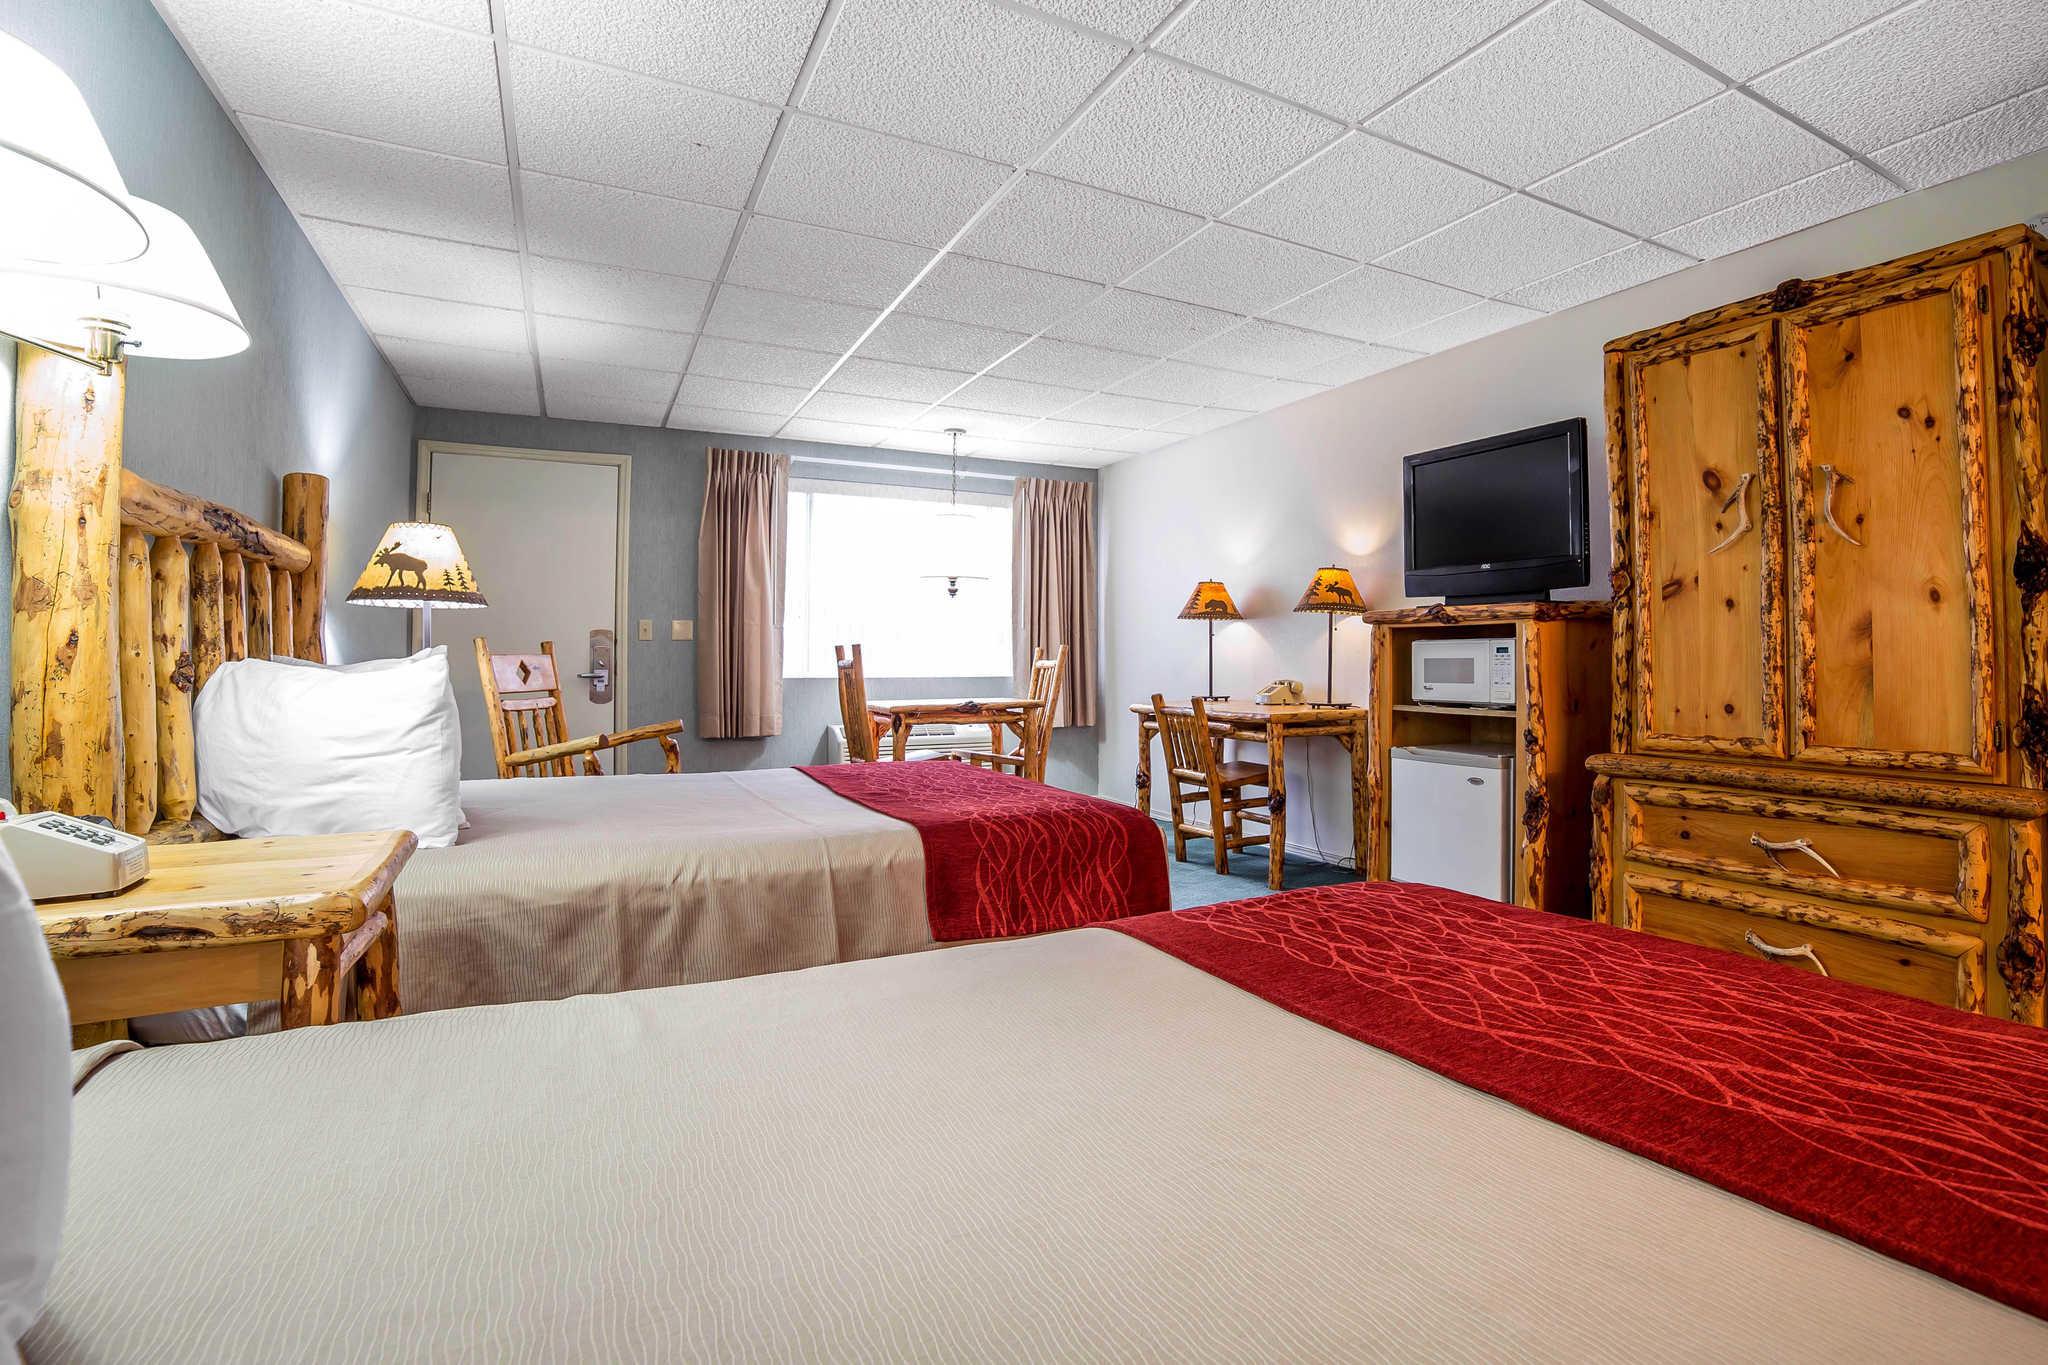 Rodeway Inn Pronghorn Lodge image 23